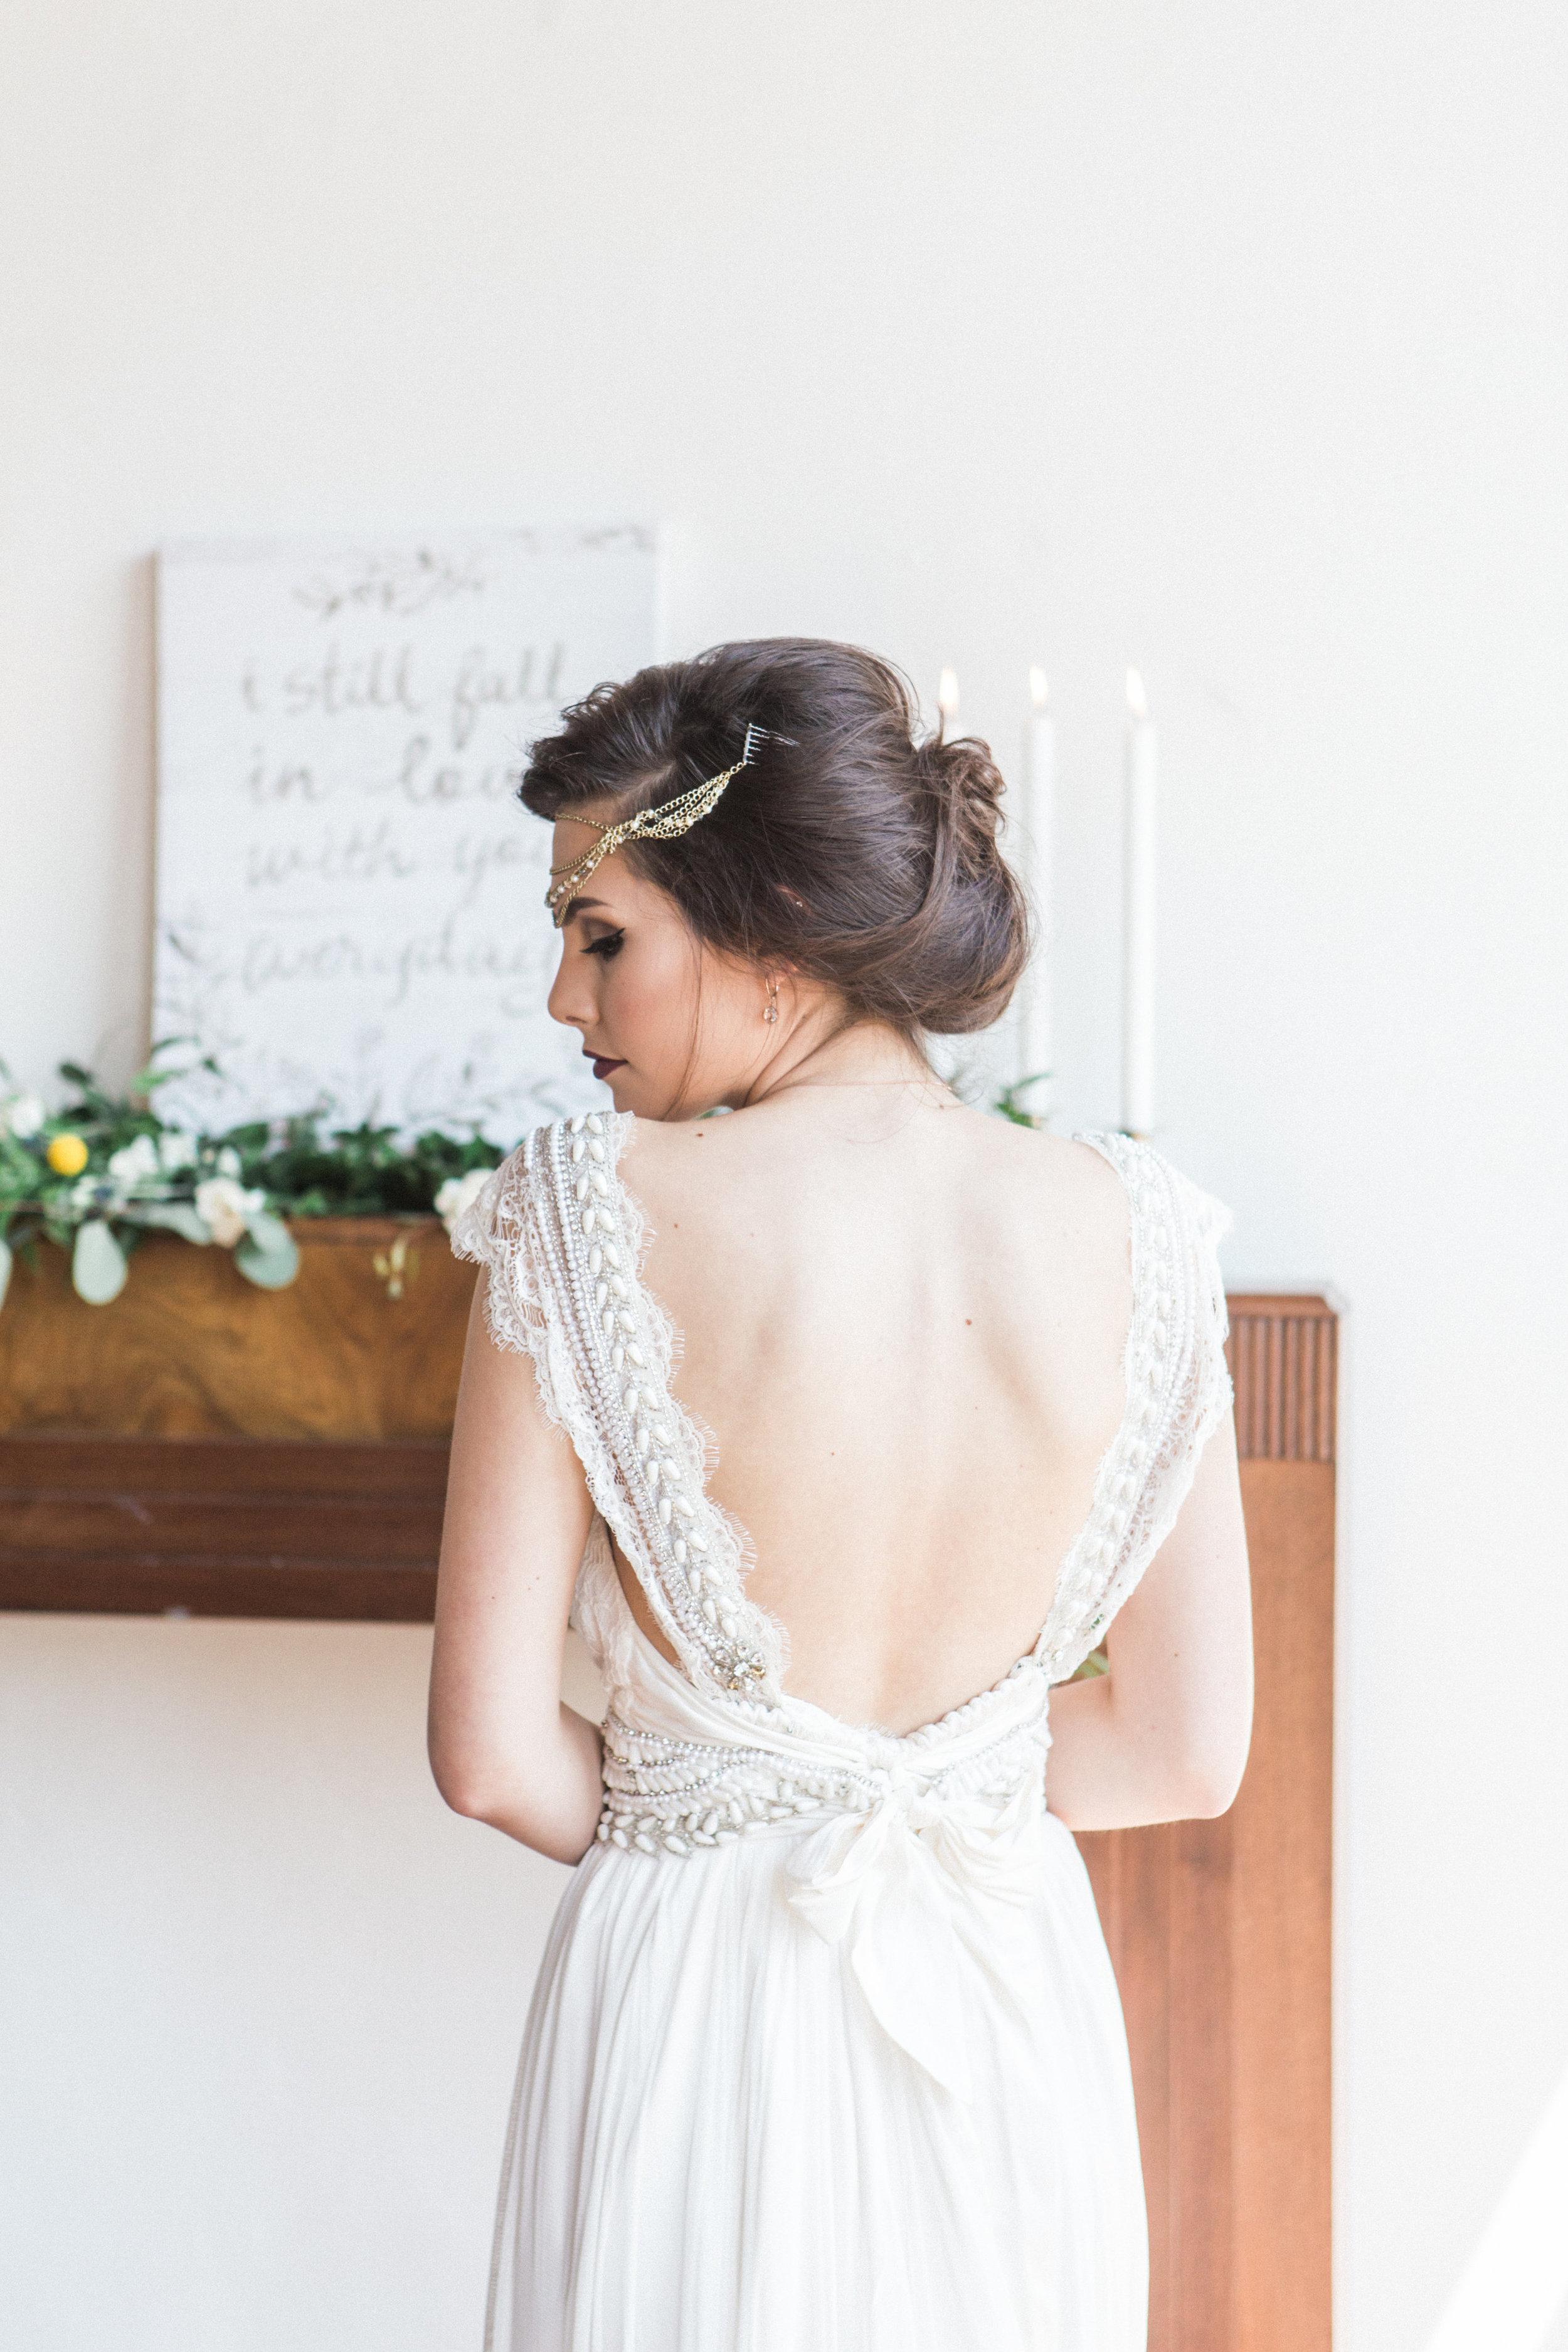 anna-campbell-coco-christa-o'brien-photography-the-corner-district-wedding-atlanta-wedding-savannah-bridal-boutique-ivory-and-beau-bridal-boutique-savannah-bridal-gowns-savannah-bridal-atlanta-bridal-boutique-borrowed-and-blue-3.jpg